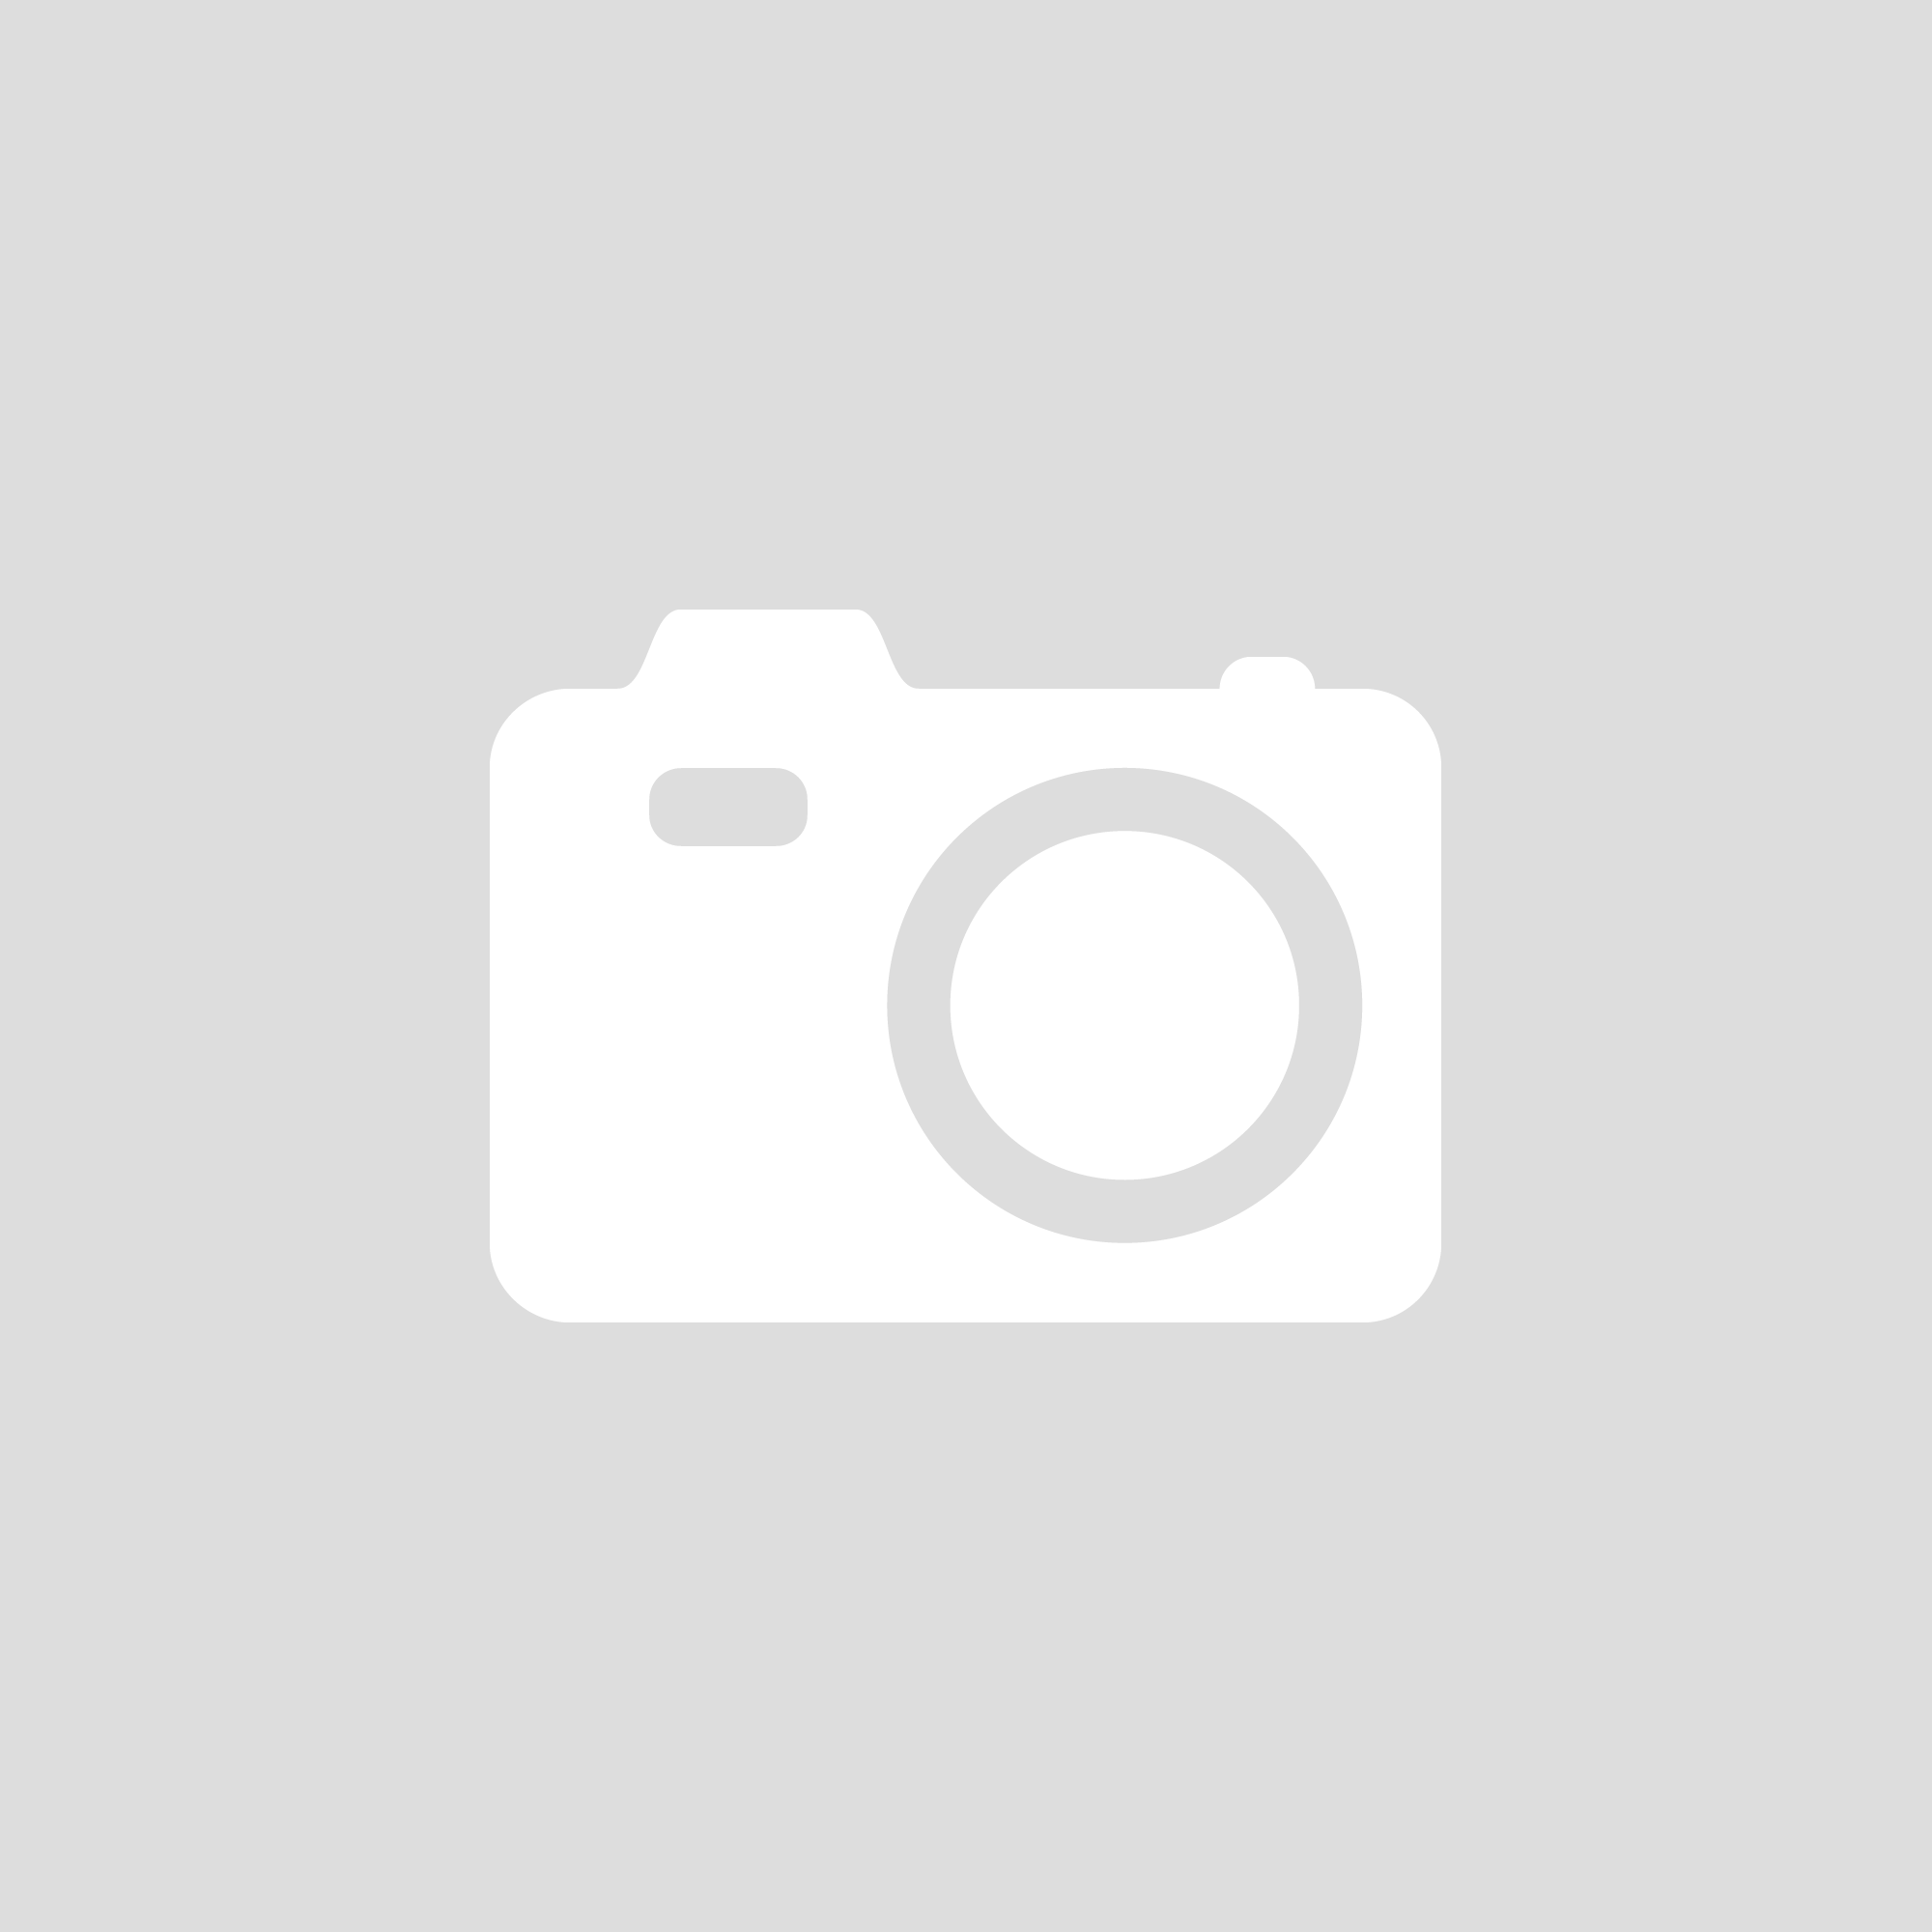 Oriel Pendant Blush by Lightmode LMB201